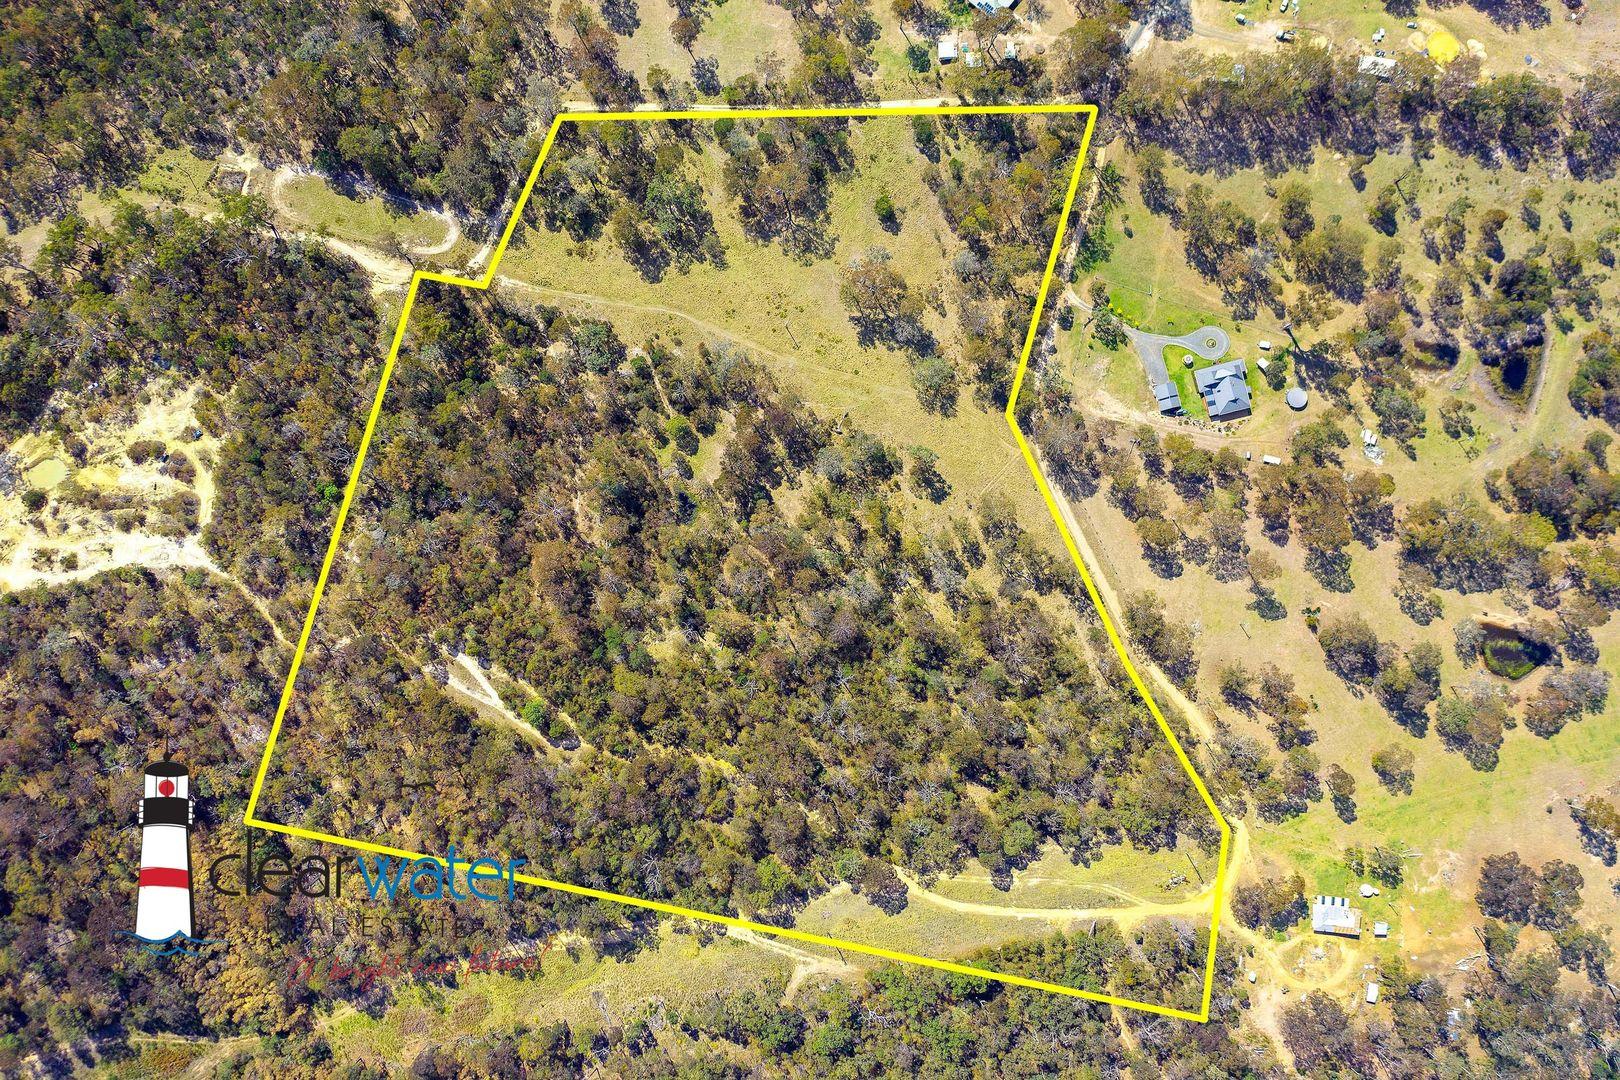 Lot/280 Summerhill Road, Moruya NSW 2537, Image 1